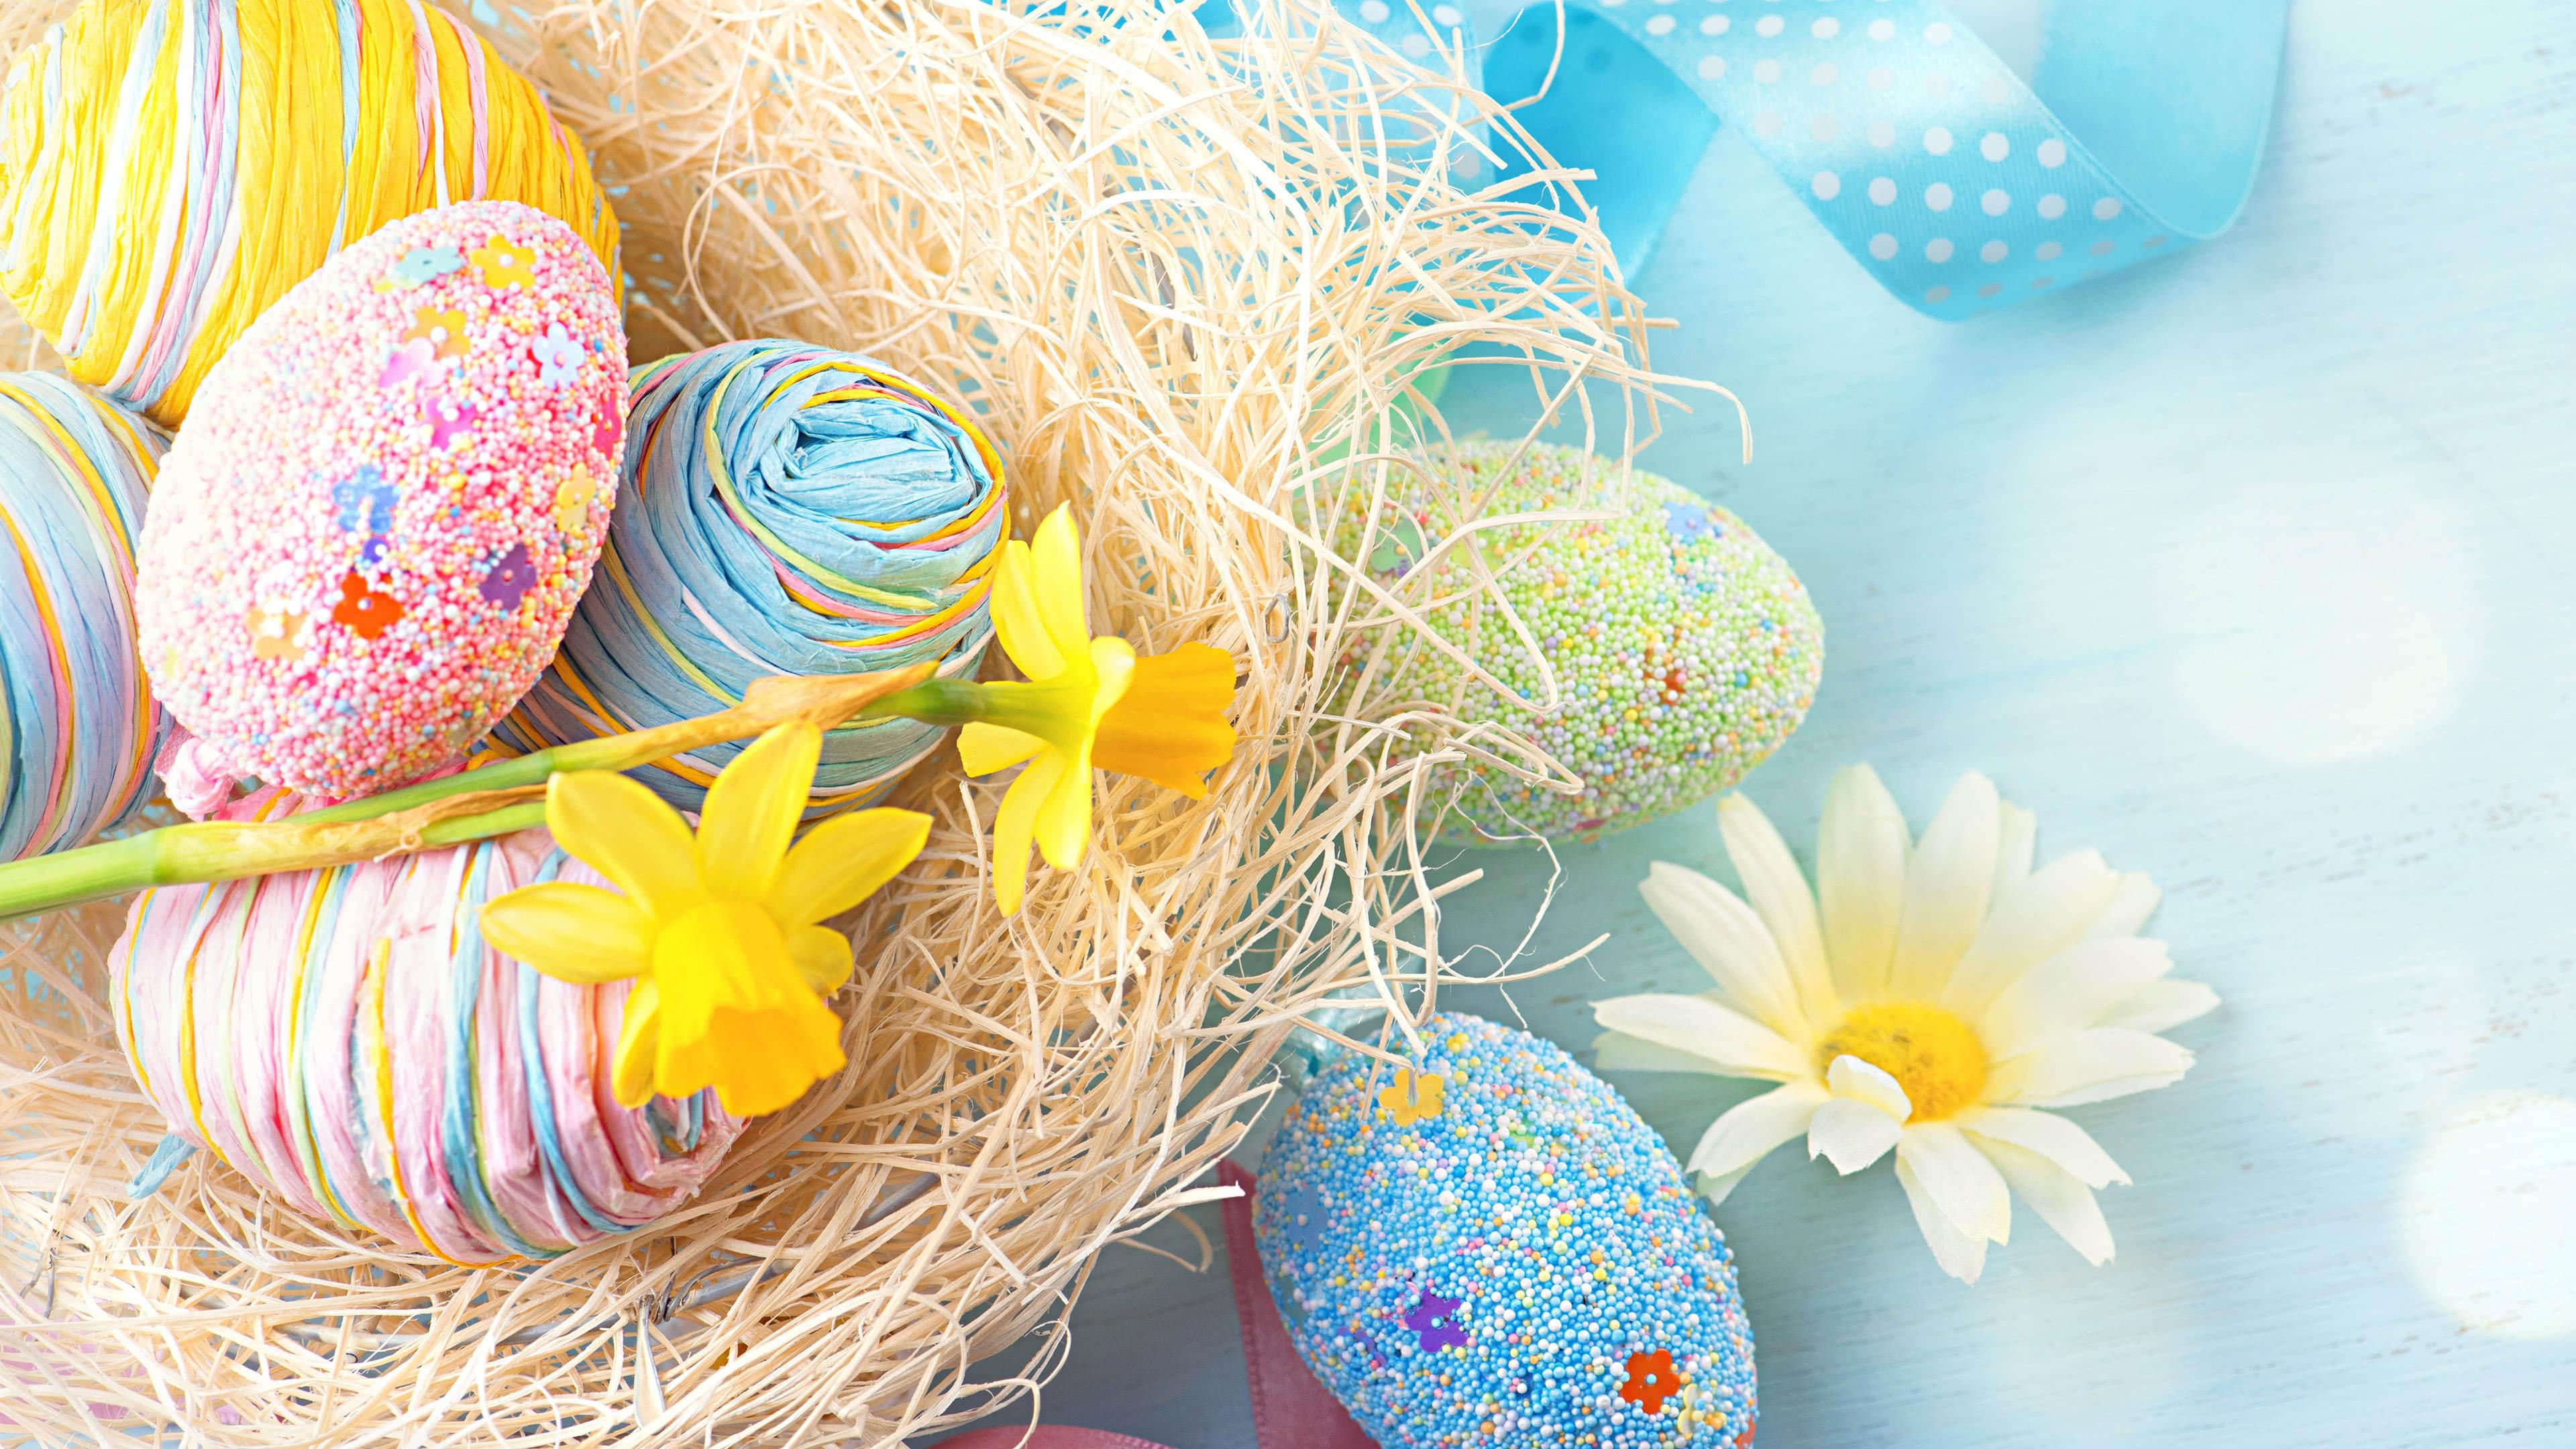 easter eggs and flowers uhd 4k wallpaper